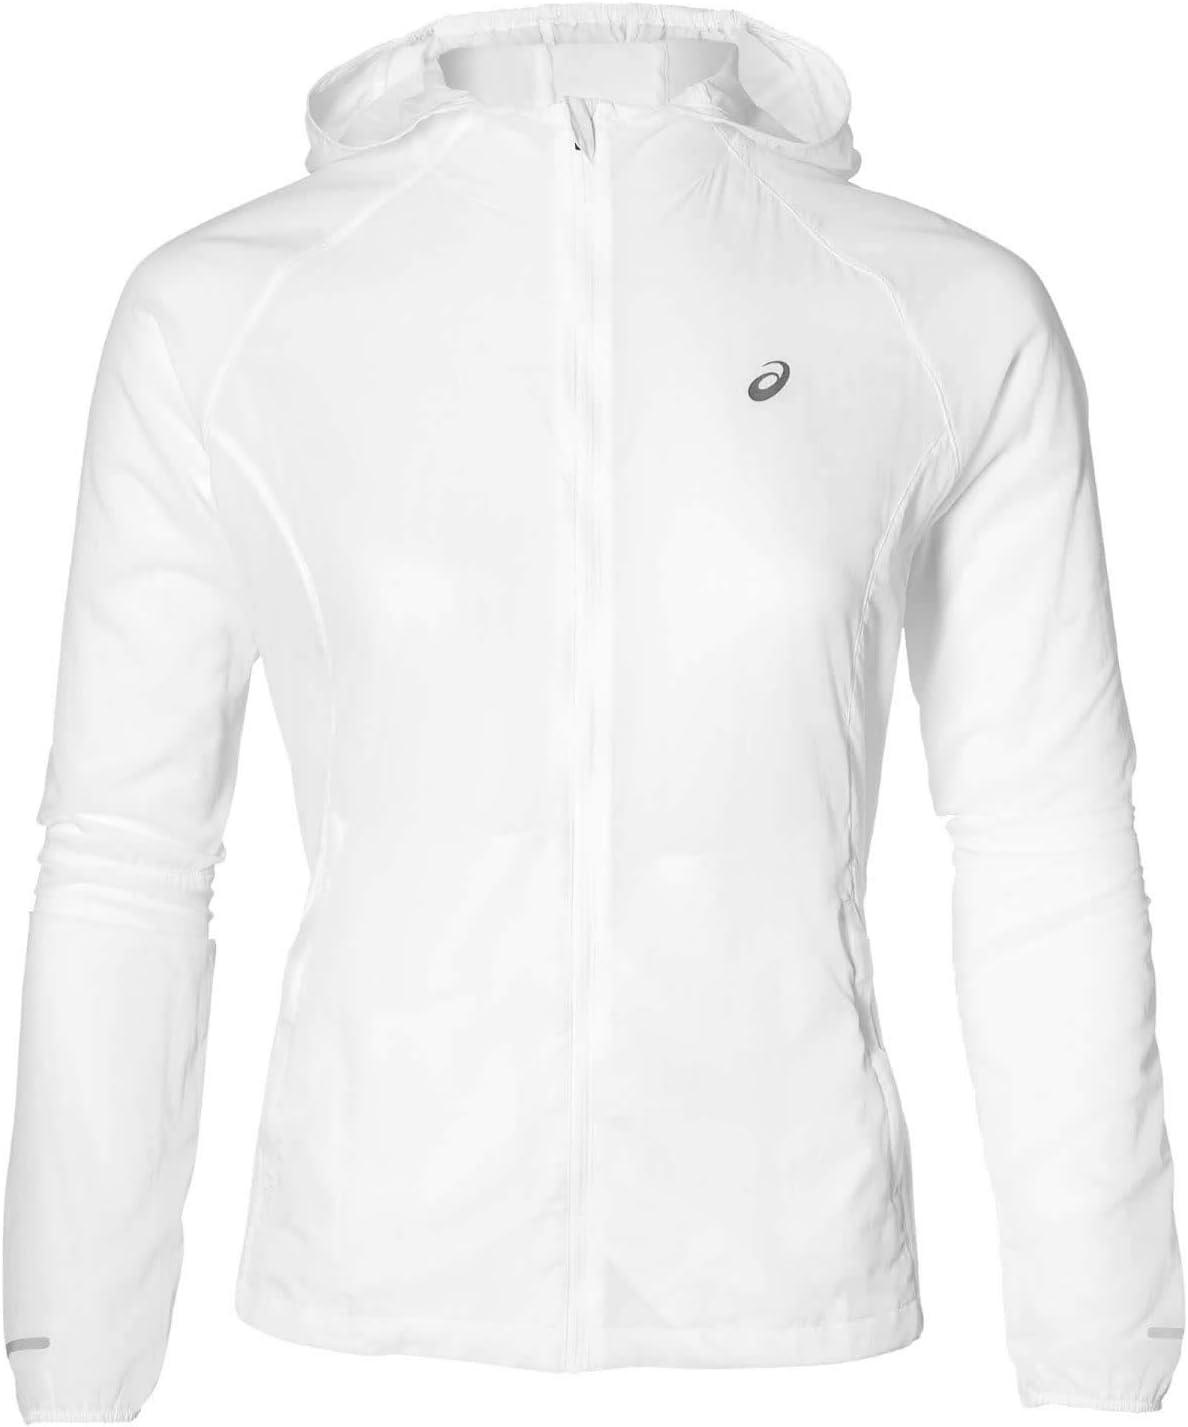 ASICS Packable Trainingsjacke-Weiß, Silber Chaquetas, Mujer ...